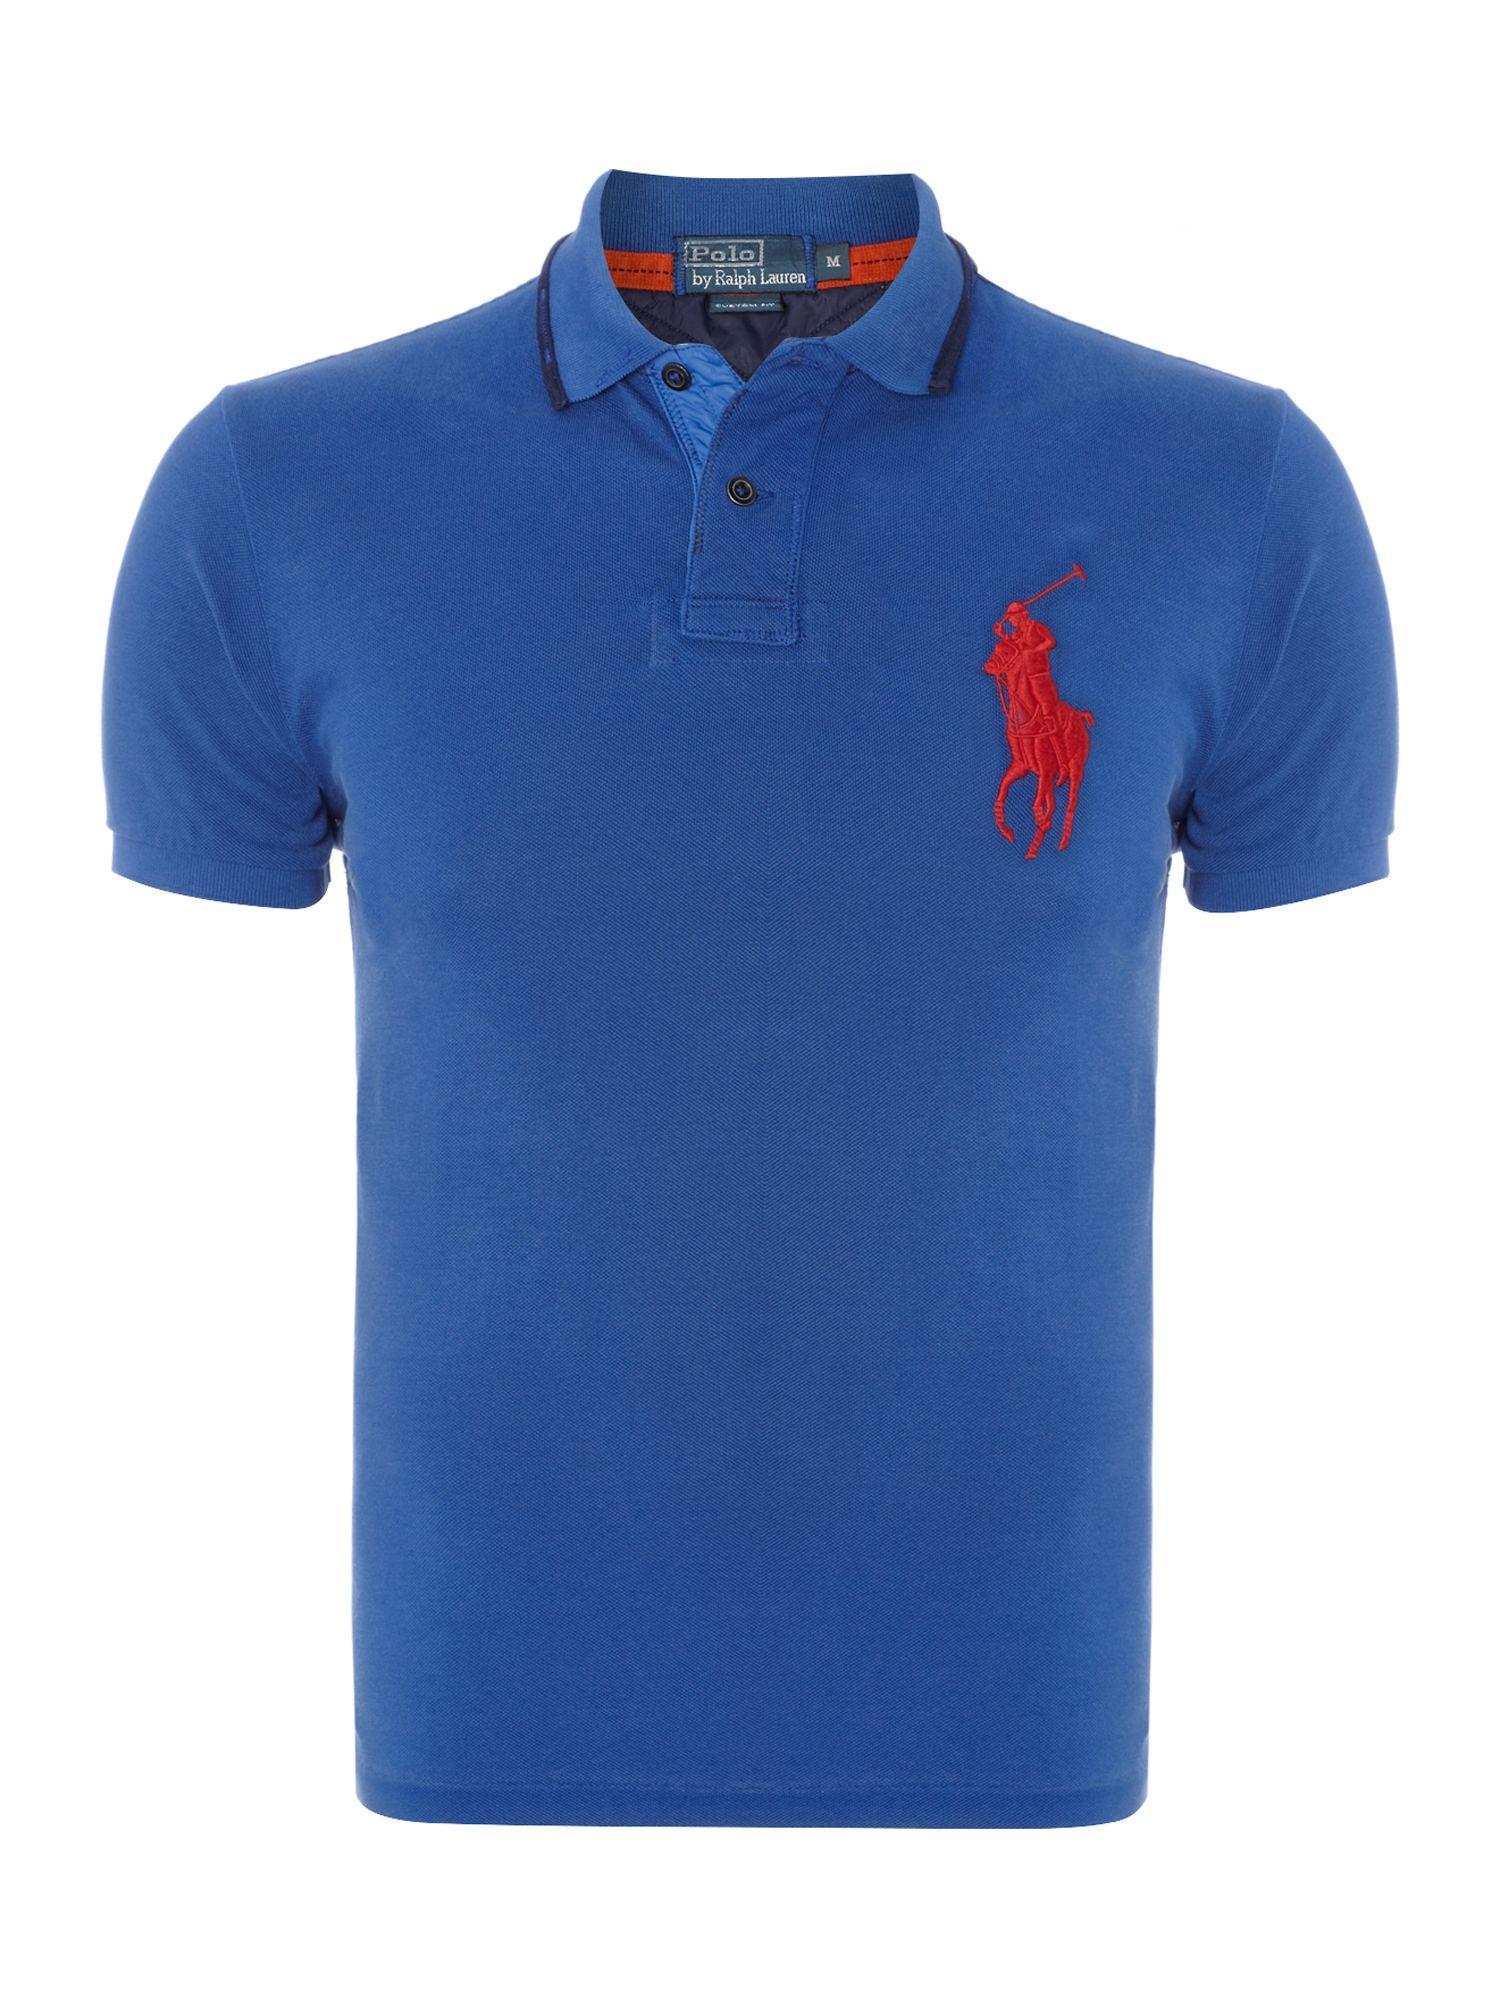 Polo ralph lauren big pony rugged custom fit polo shirt in for Polo ralph lauren custom fit polo shirt